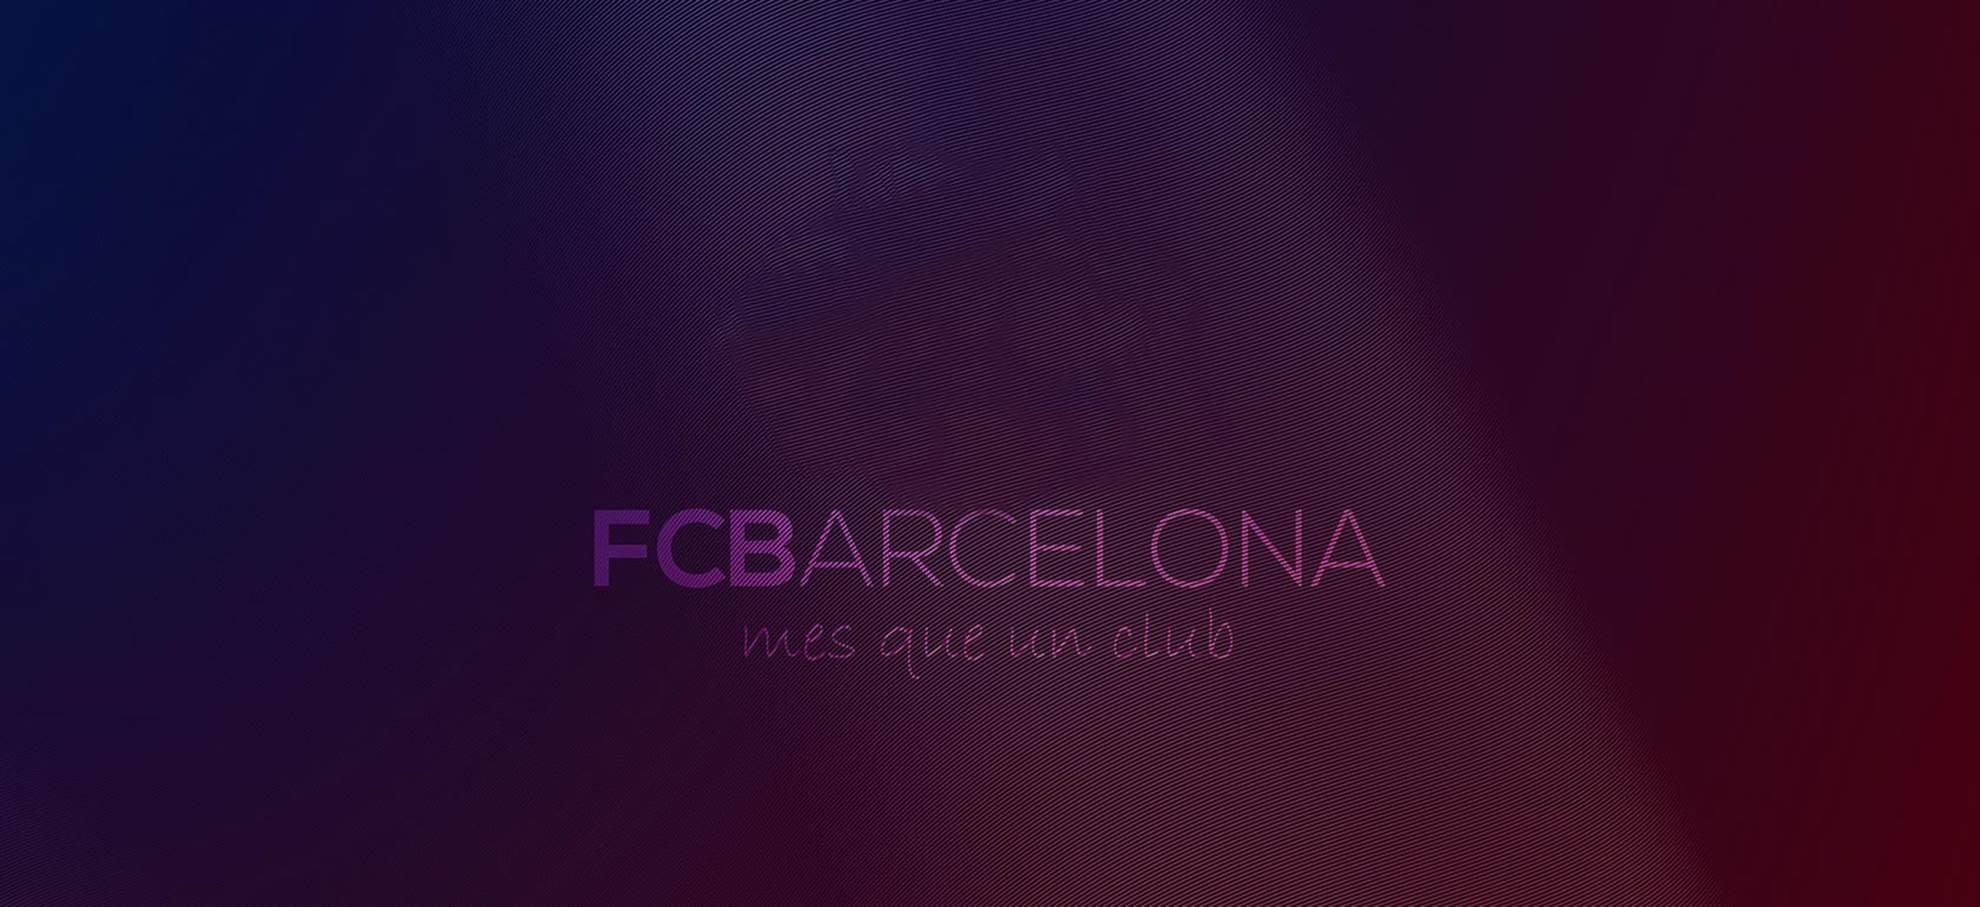 FC Barcelona - Valencia (14-09-2019)